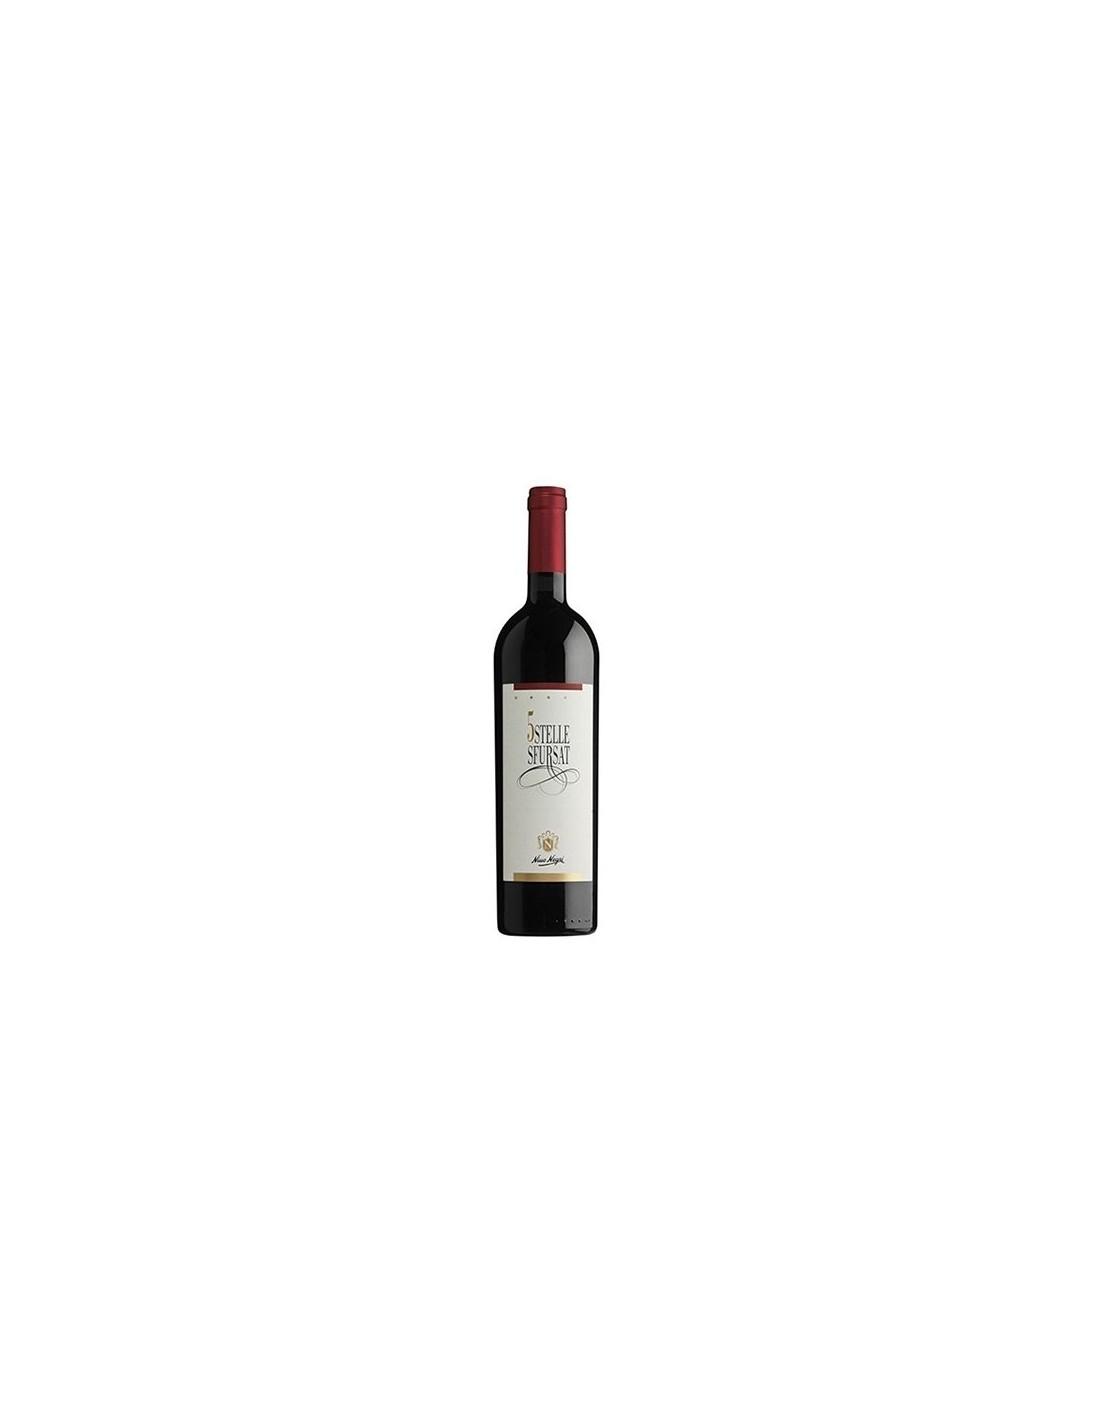 Vin rosu, Nebbiolo, 5 Stelle Sfursat Nino Negri Valtellina, 0.75L, 16% alc., Italia